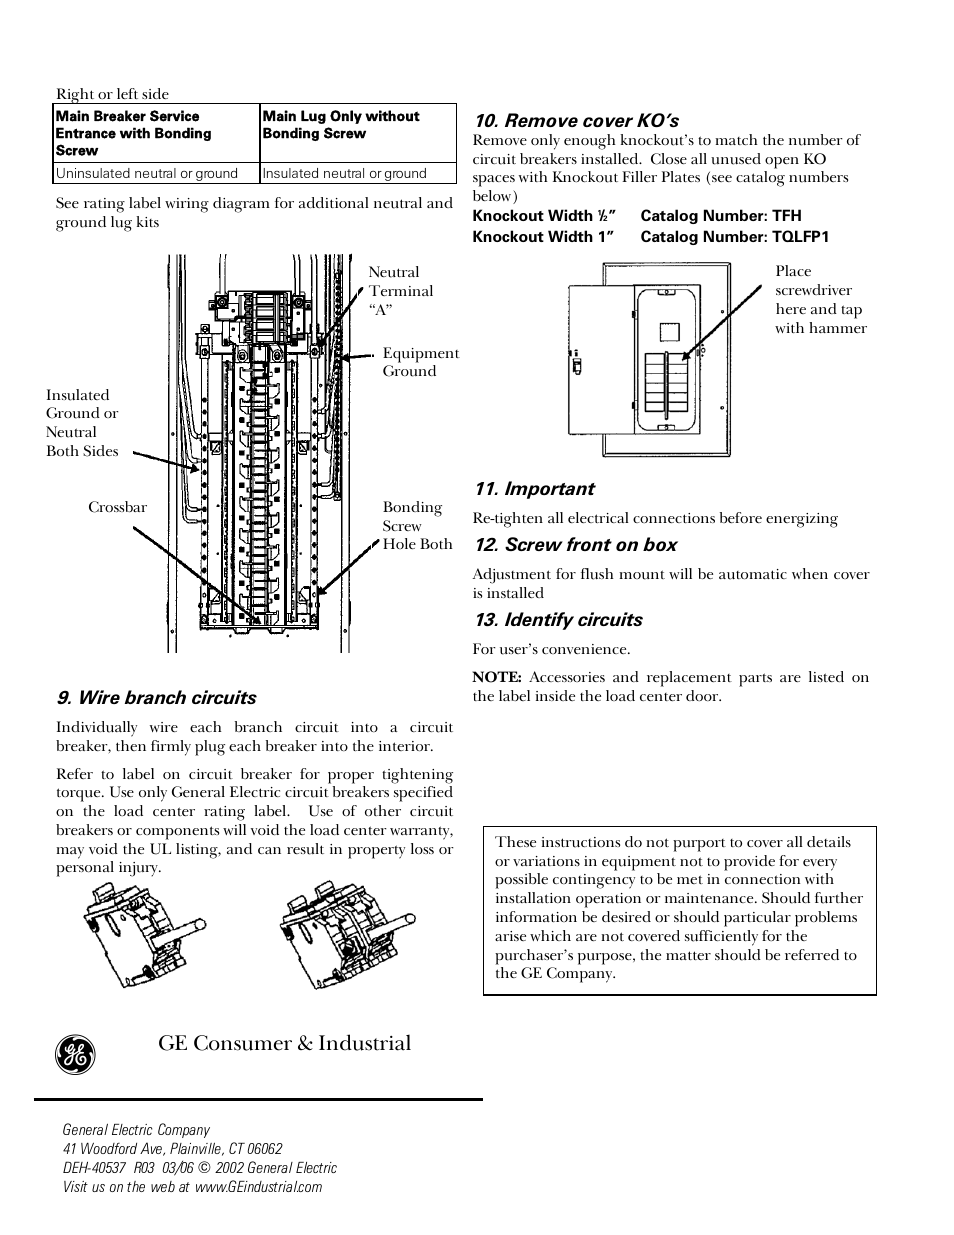 famous load center wiring schematic image electrical and wiring home electrical wiring diagrams funky load center wiring diagram wiring diagram 1990 dodge caravan